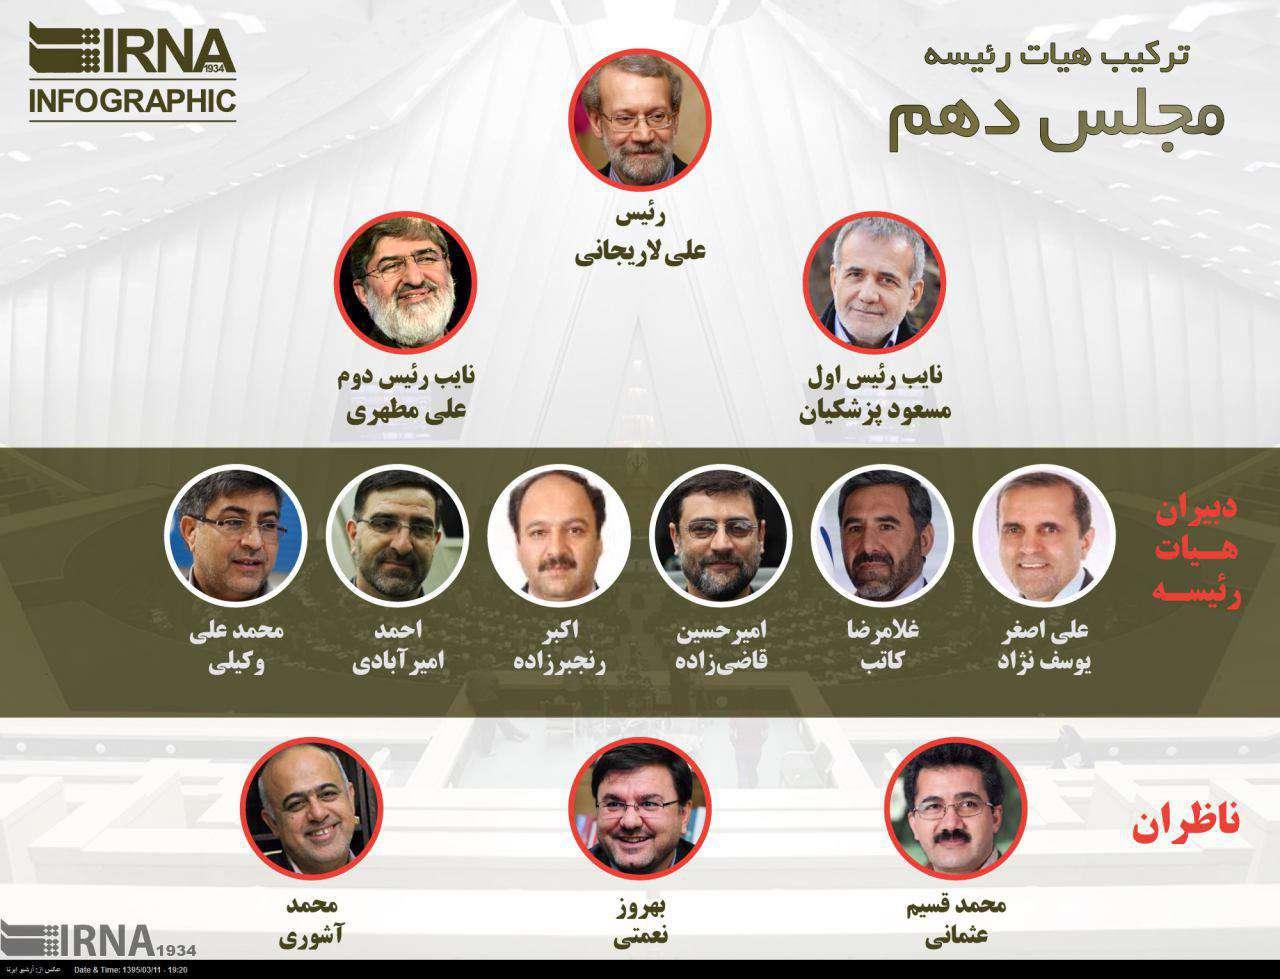 ترکیب هیئت رییسه مجلس